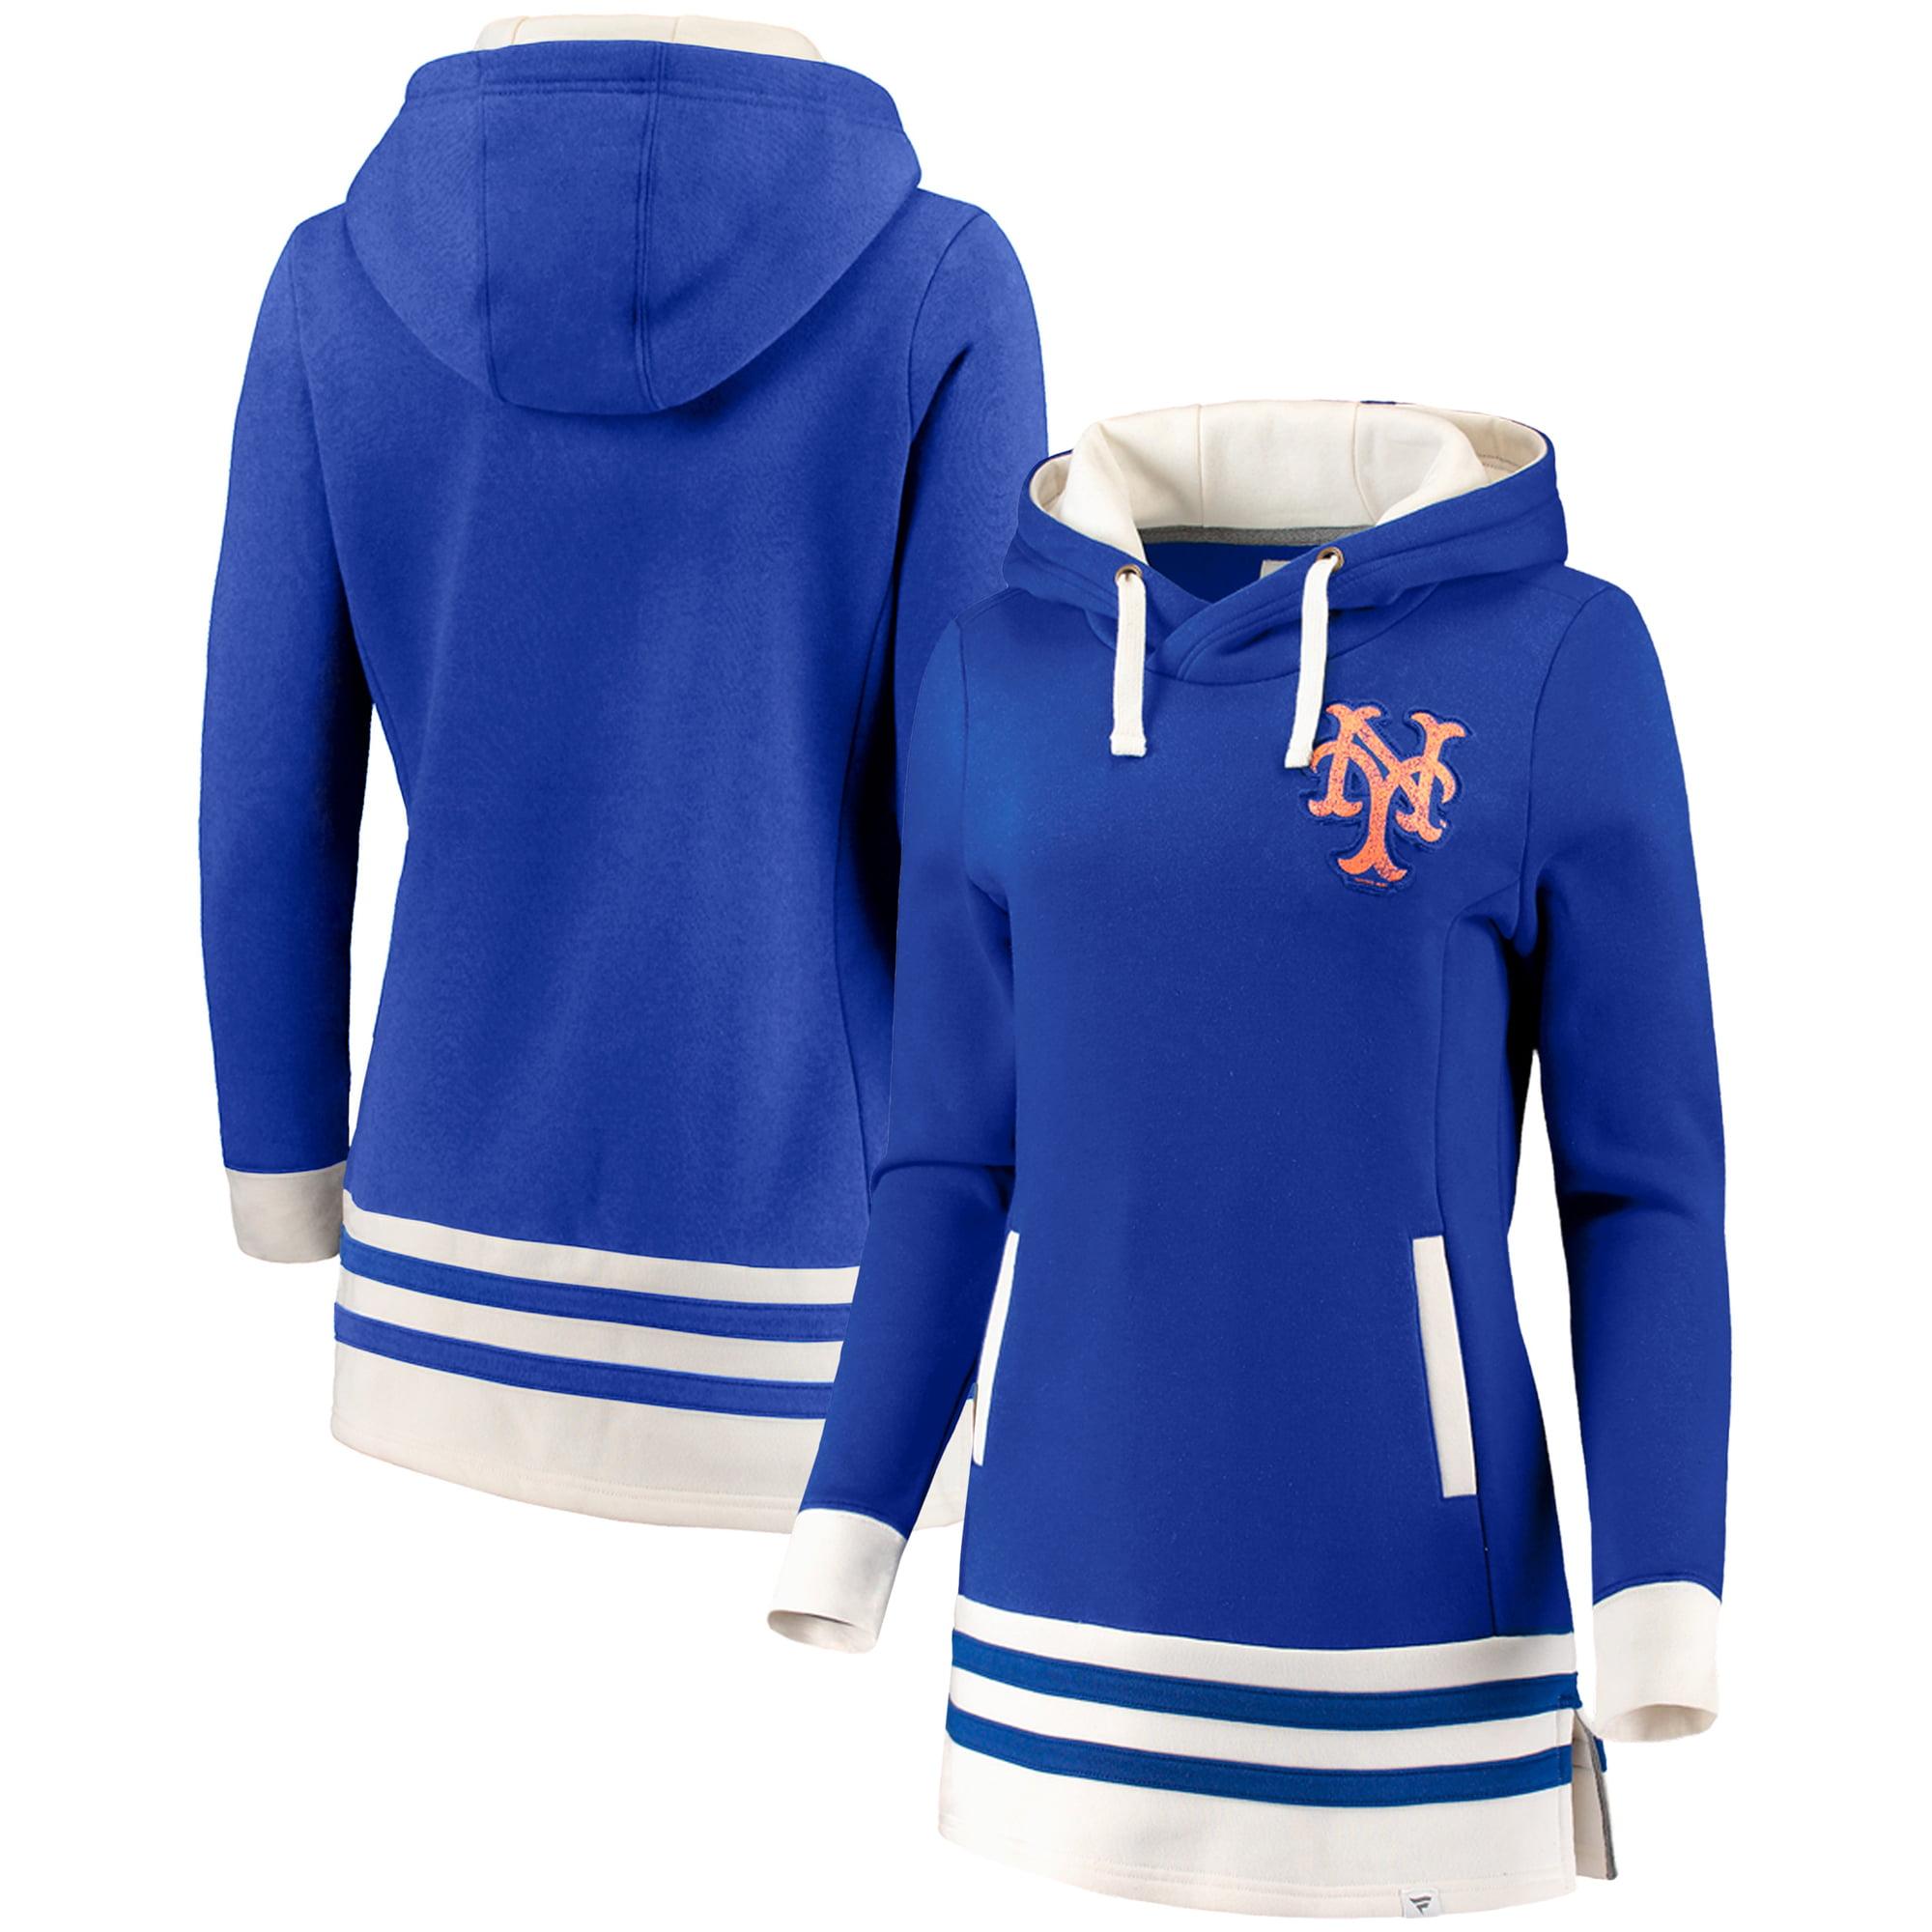 New York Mets Fanatics Branded Women's True Classics Pullover Tunic Hoodie - Royal